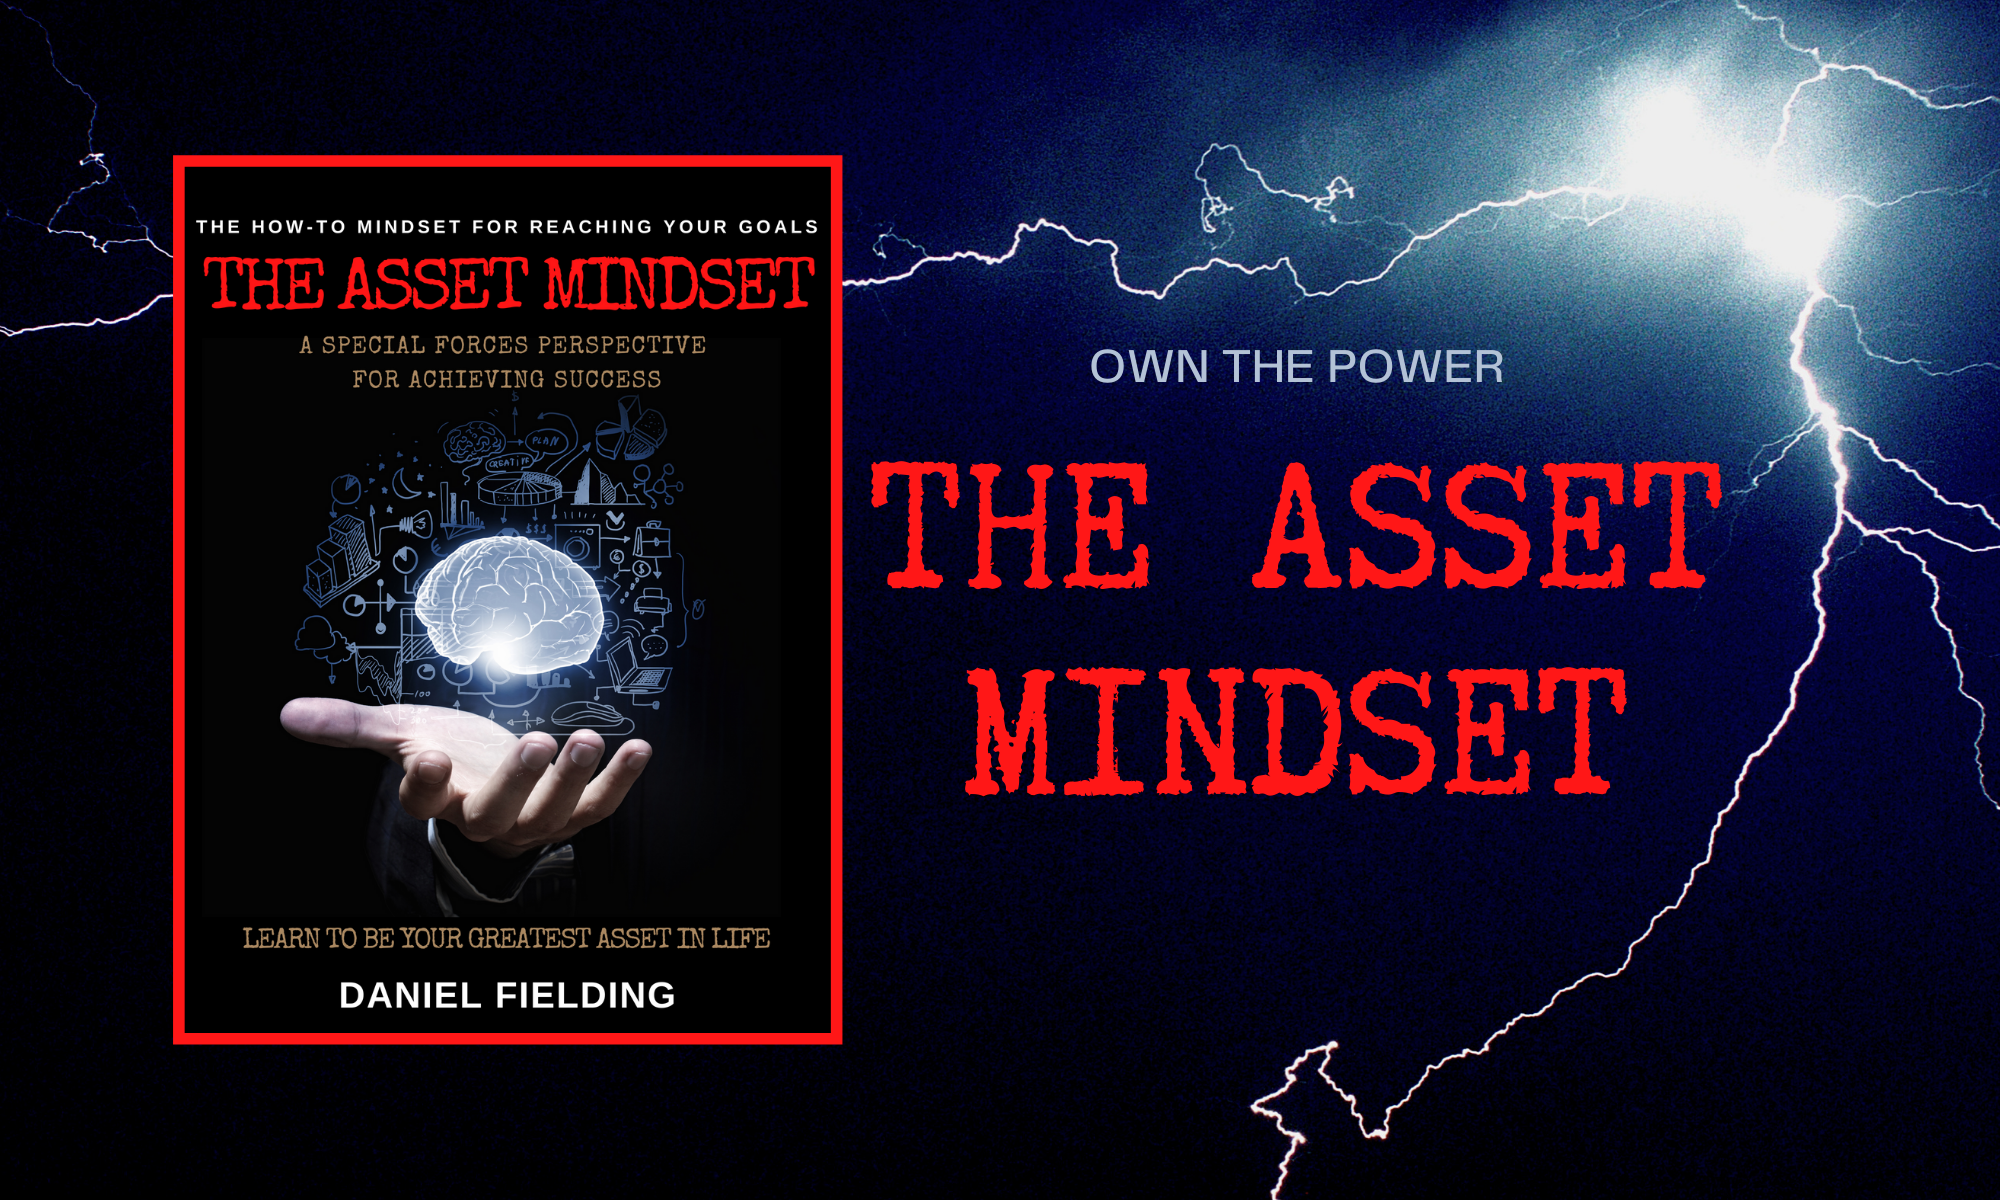 The Asset Mindset